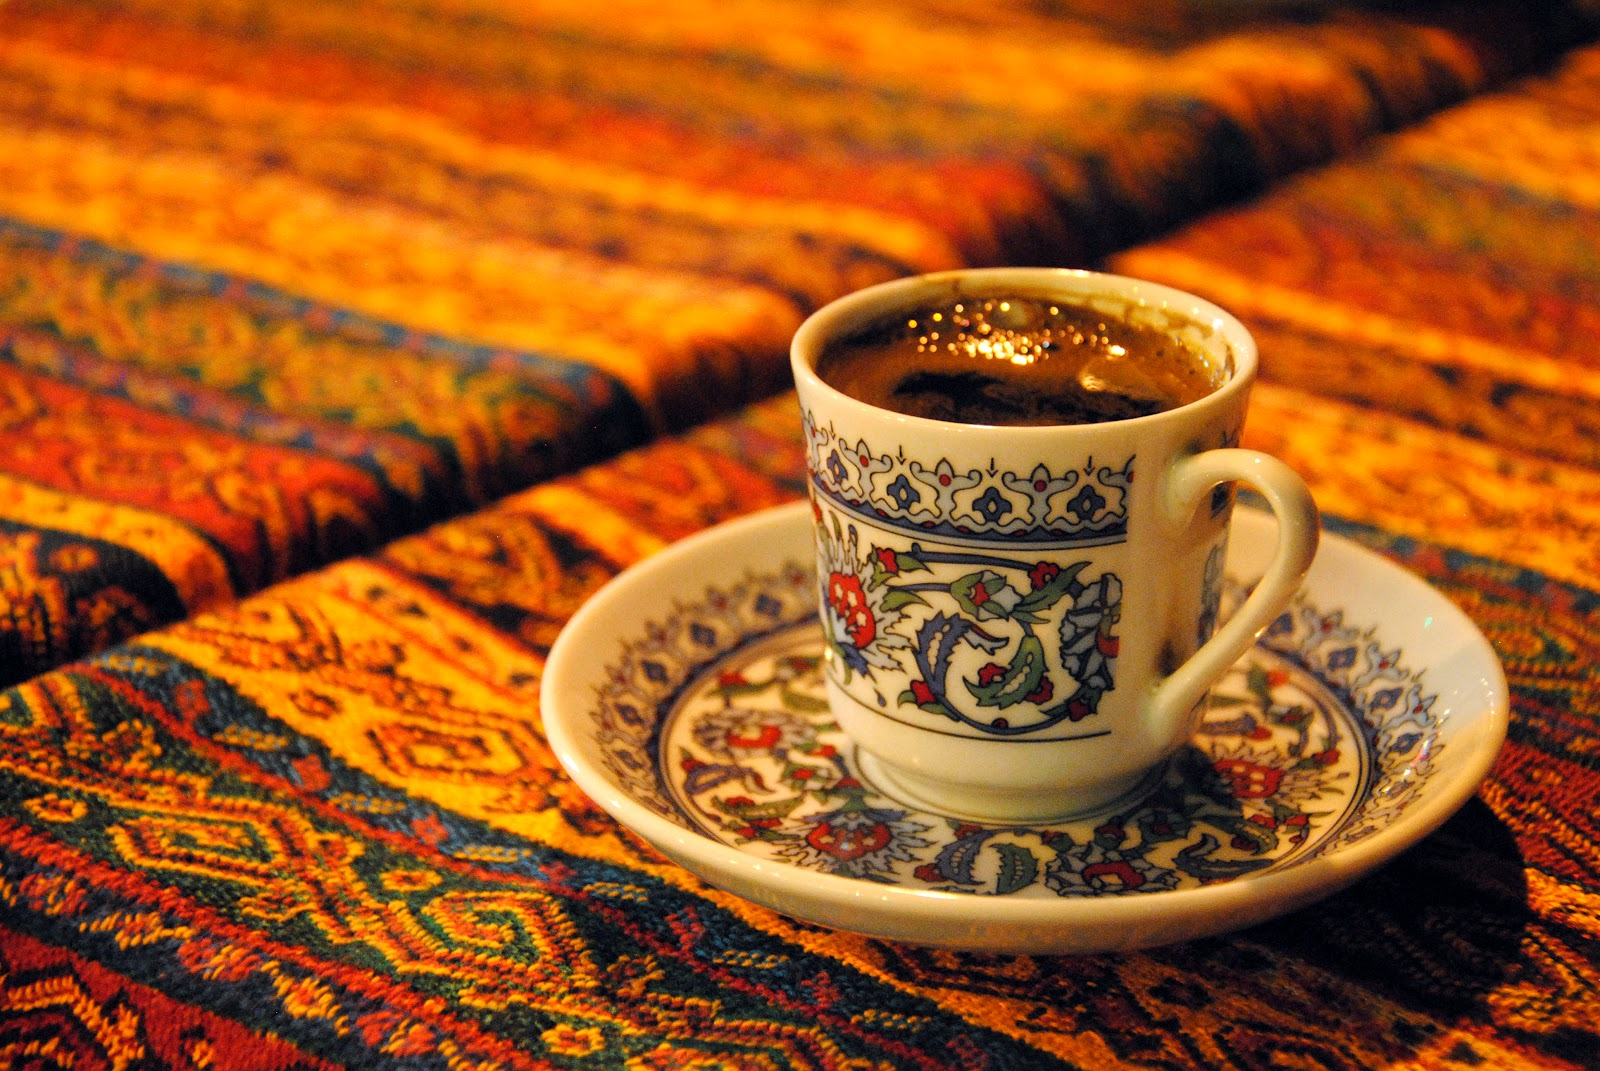 turk-kahvesi-icmenin-adabi